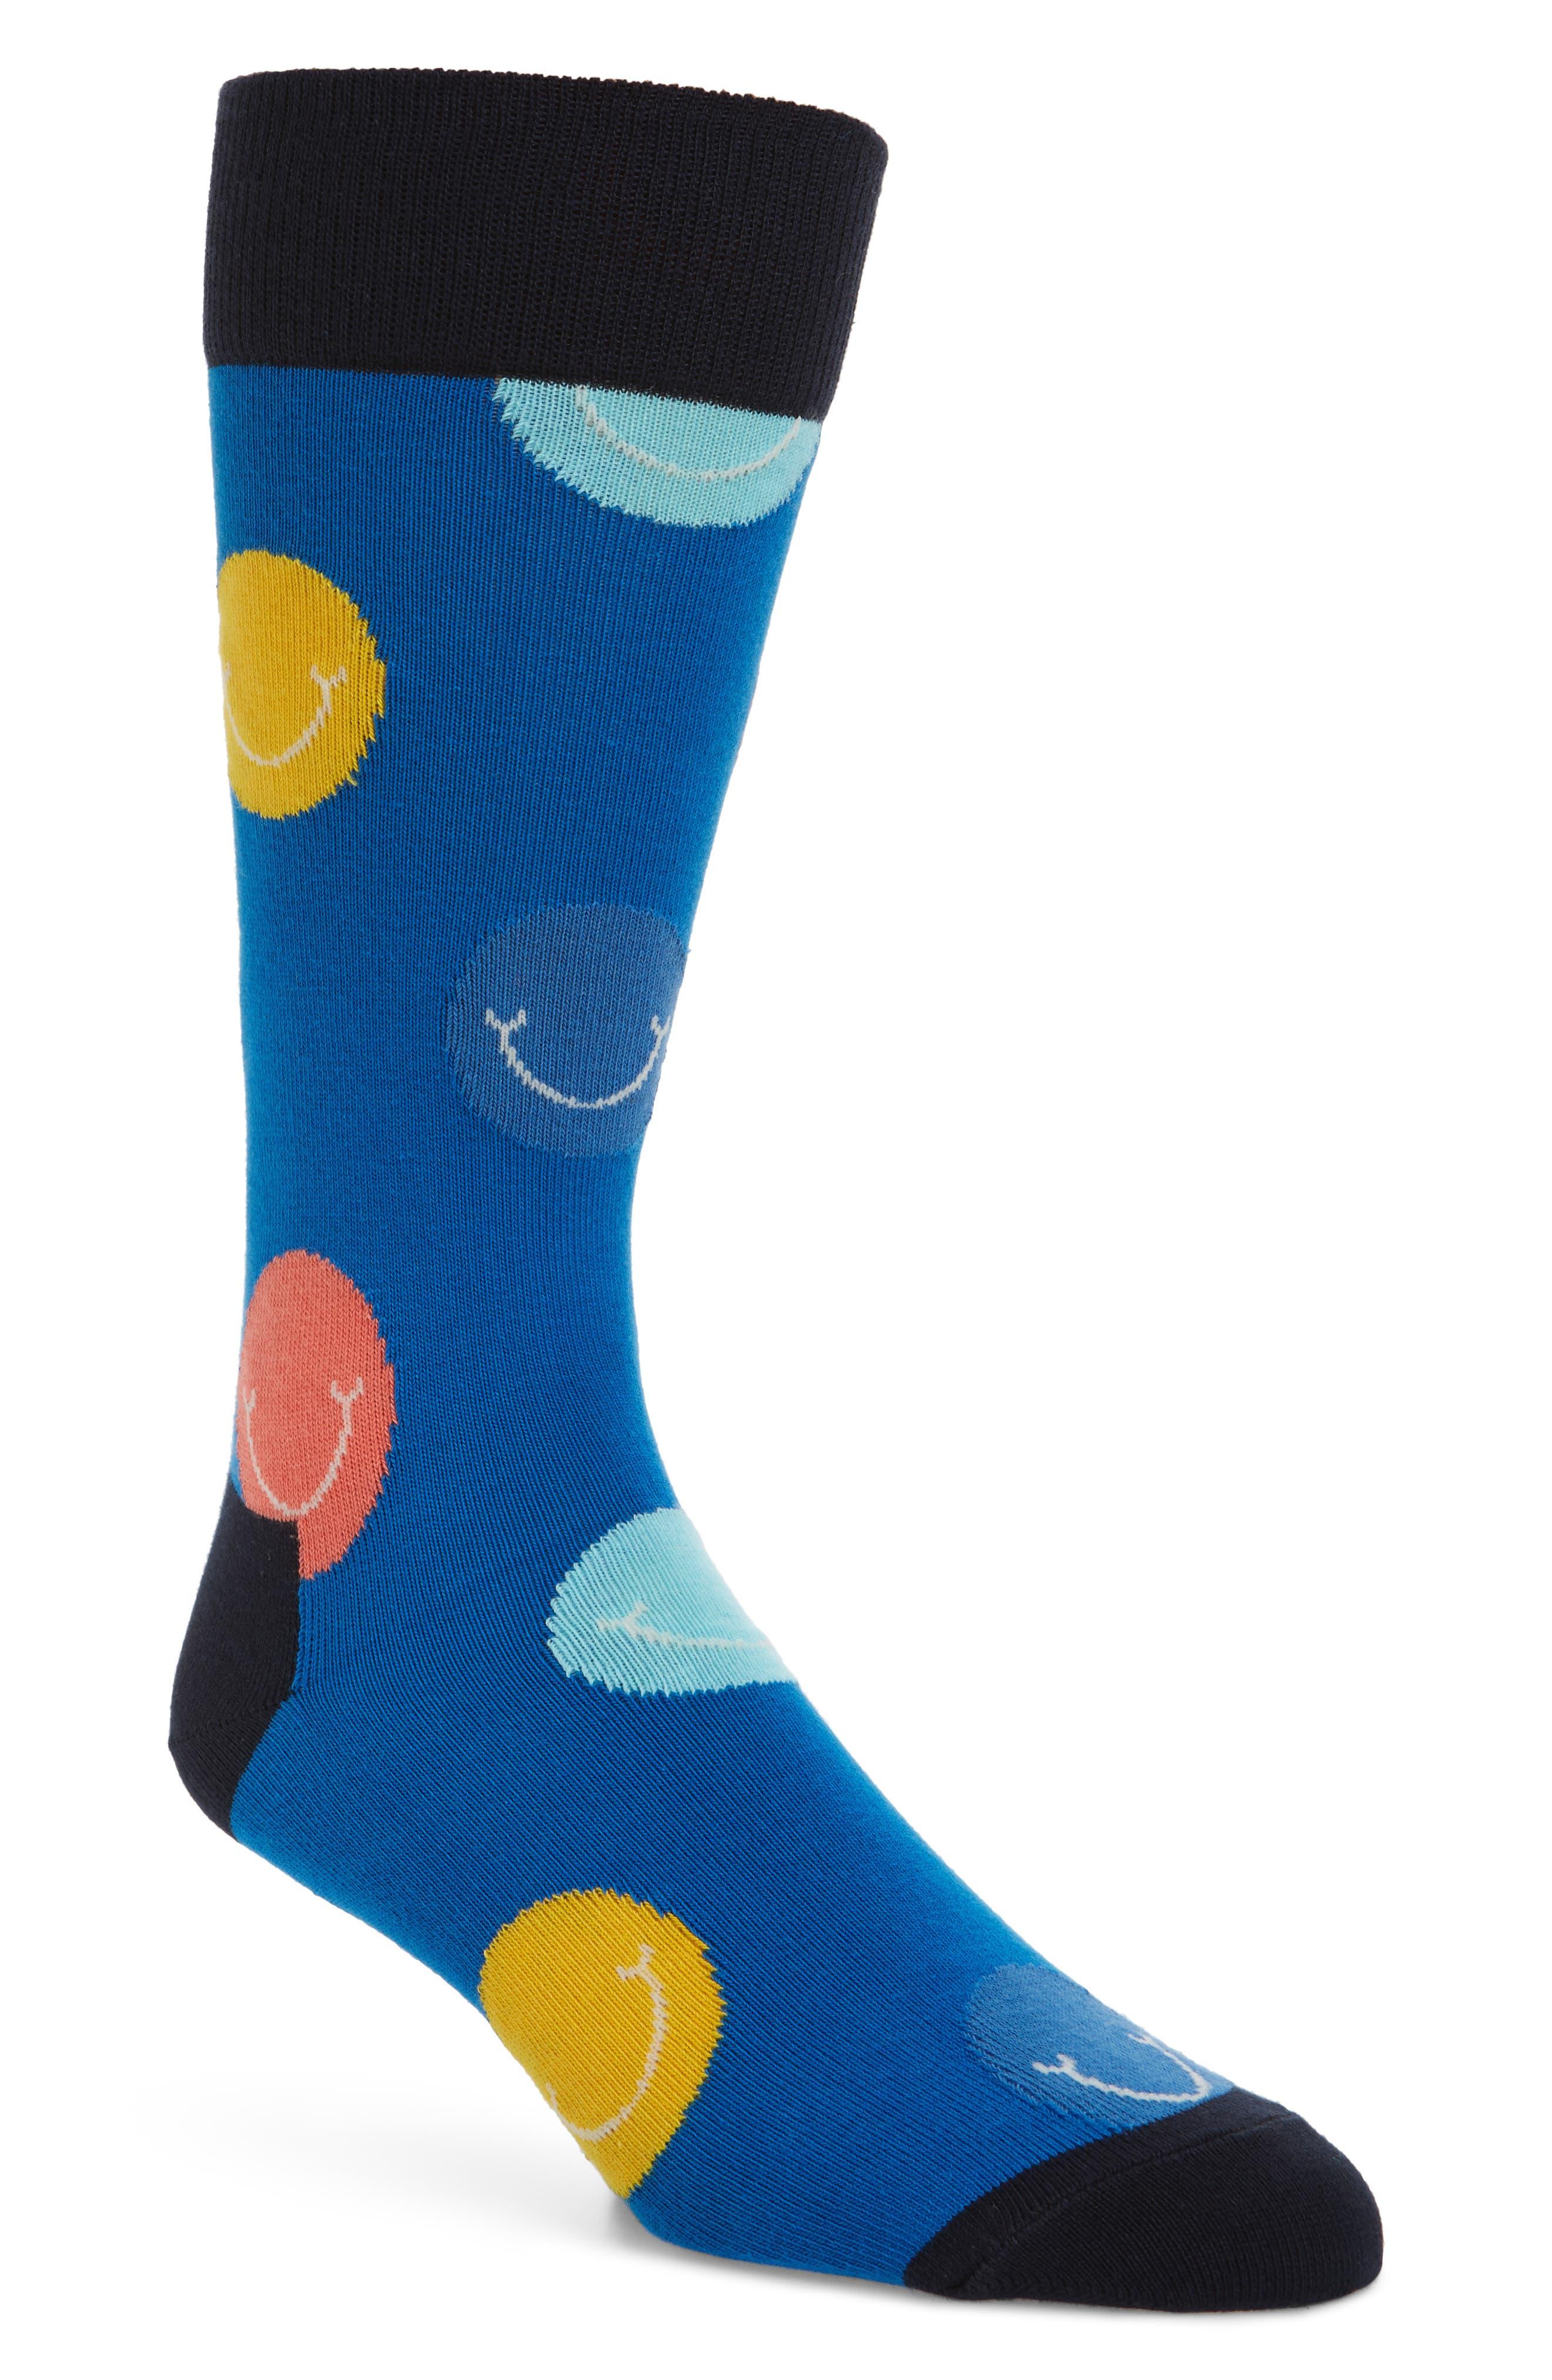 Smile Socks,                         Main,                         color, Blue Multi